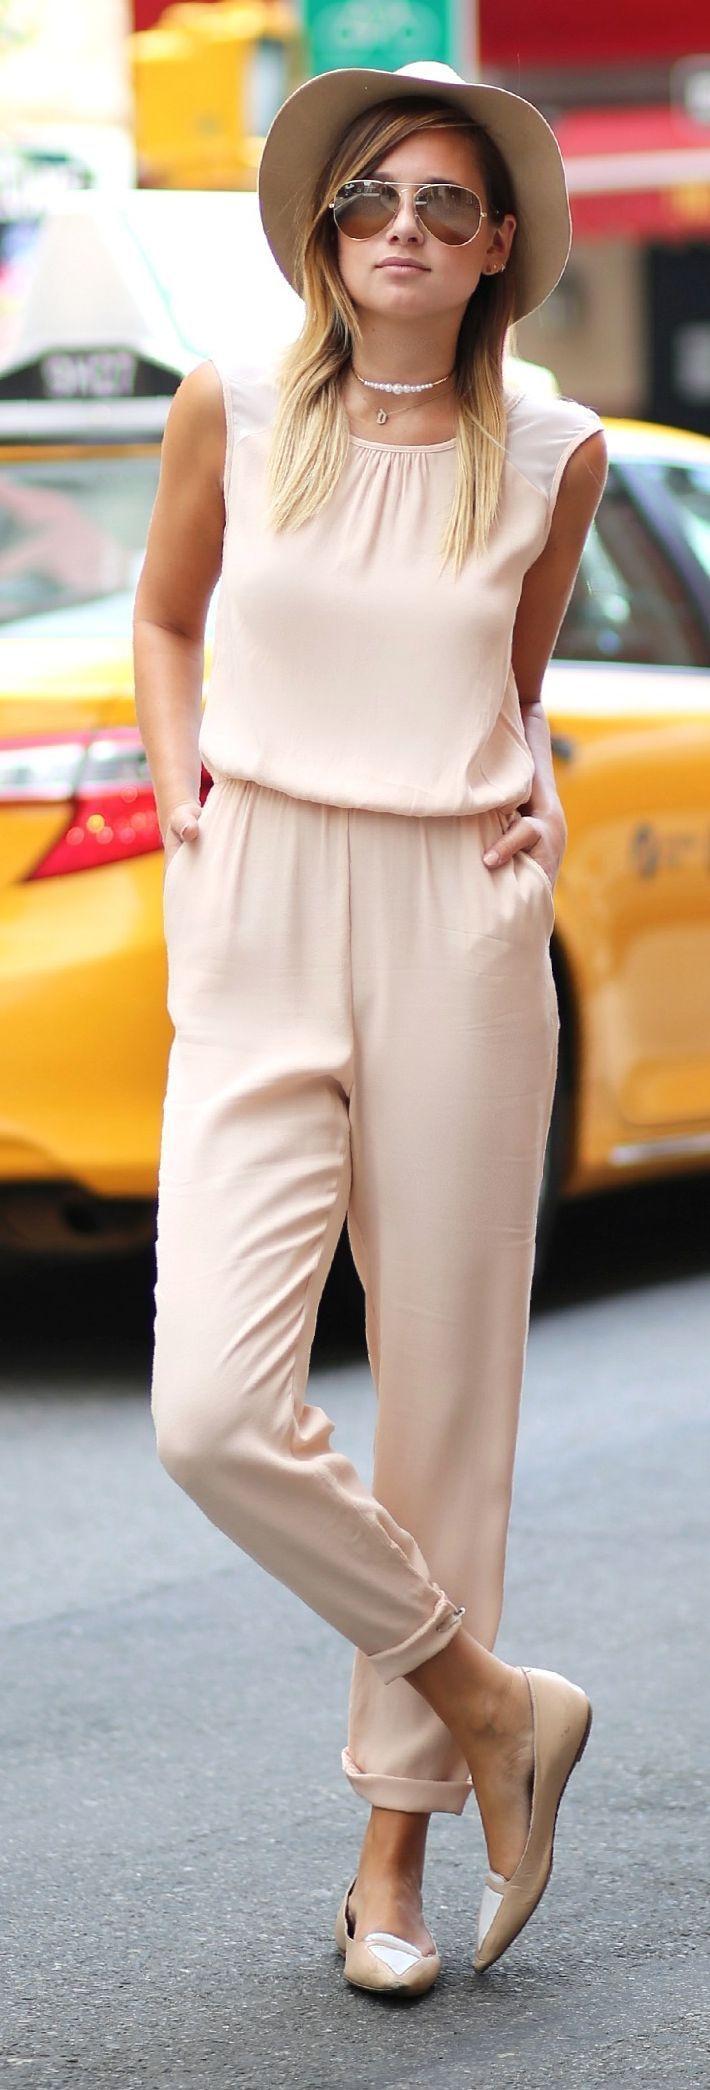 Zara Nude Sleeveless Drawstring Waist Jumpsuit by We Wore What